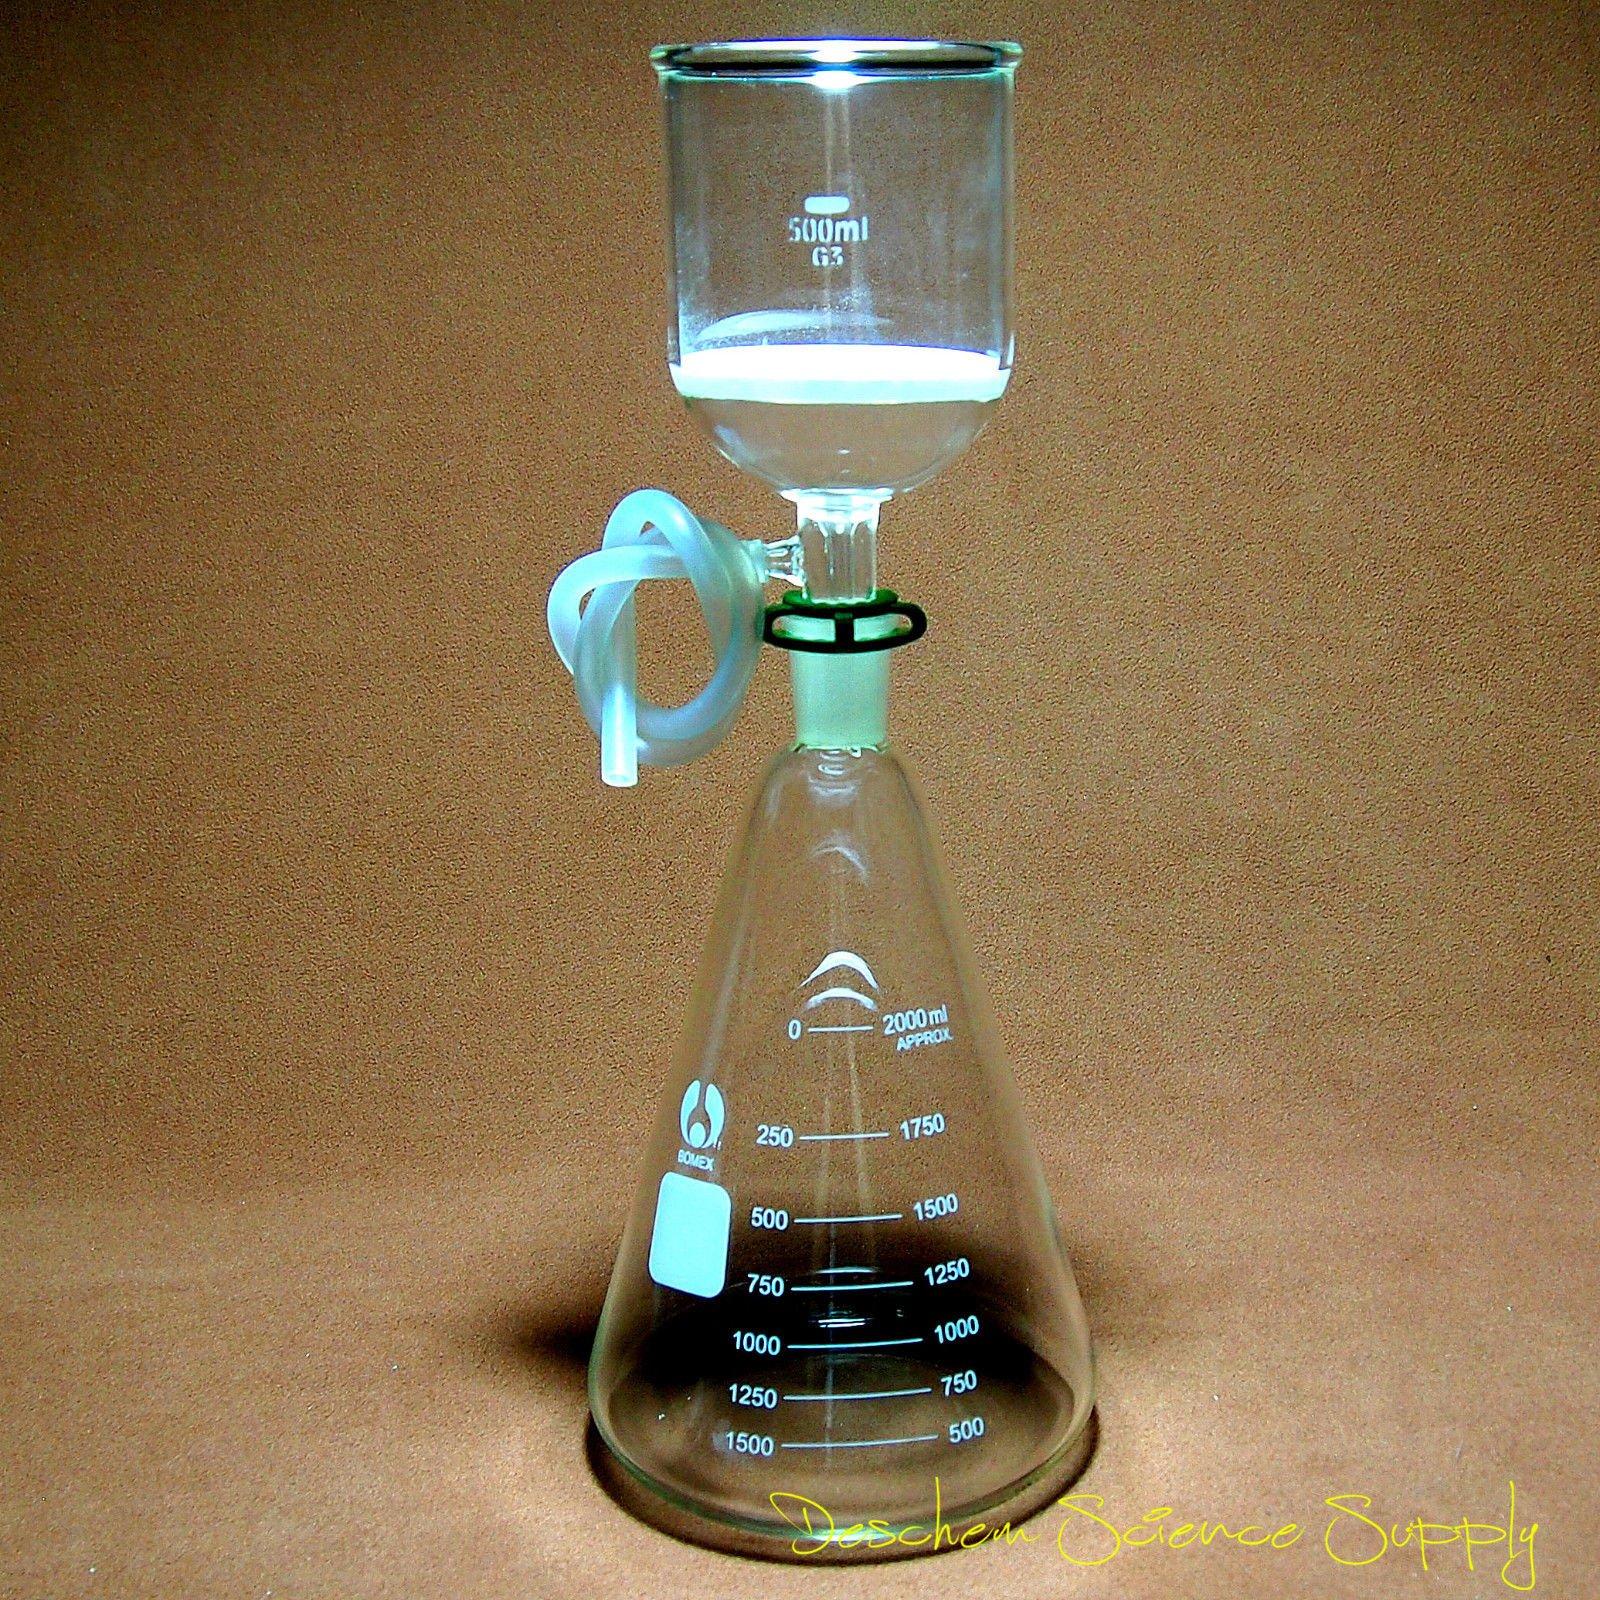 Deschem 2000ml,24/40,Glass Suction Filtration Kit,500ml Buchner Funnel & 2L Erlenmeyer Flask